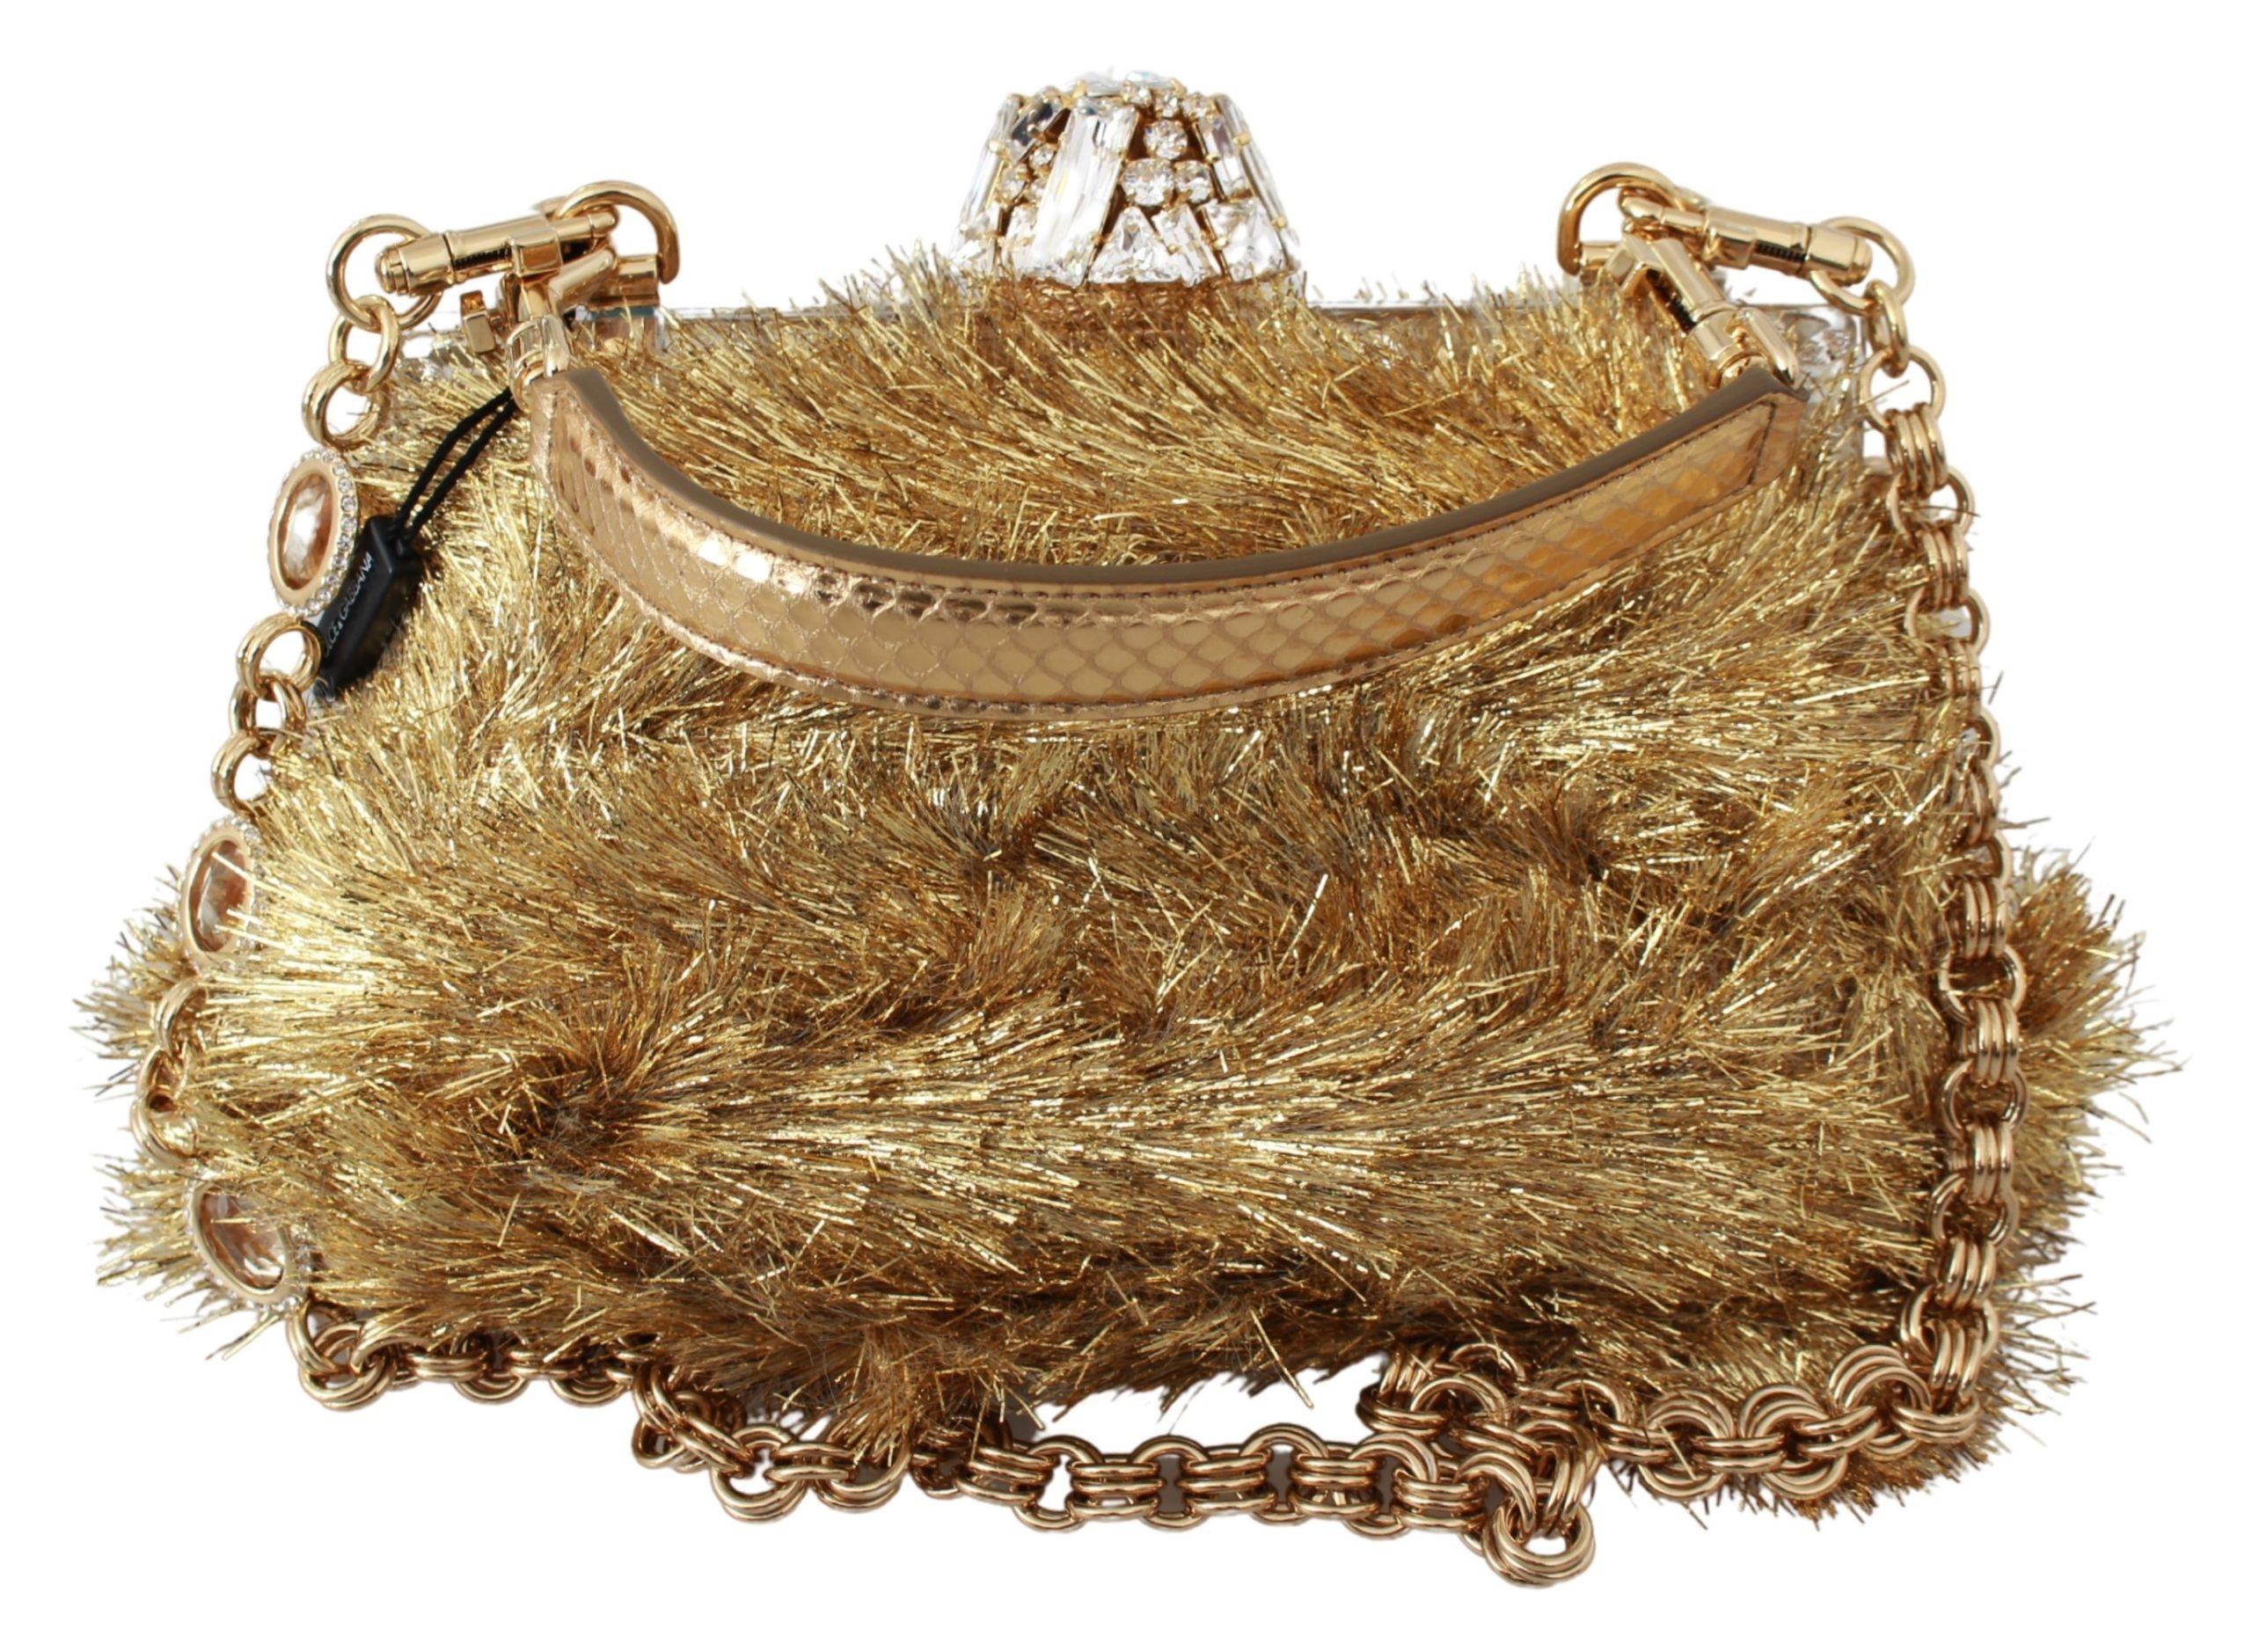 Dolce & Gabbana Women's Crystals Clutch Bag Gold VAS9381